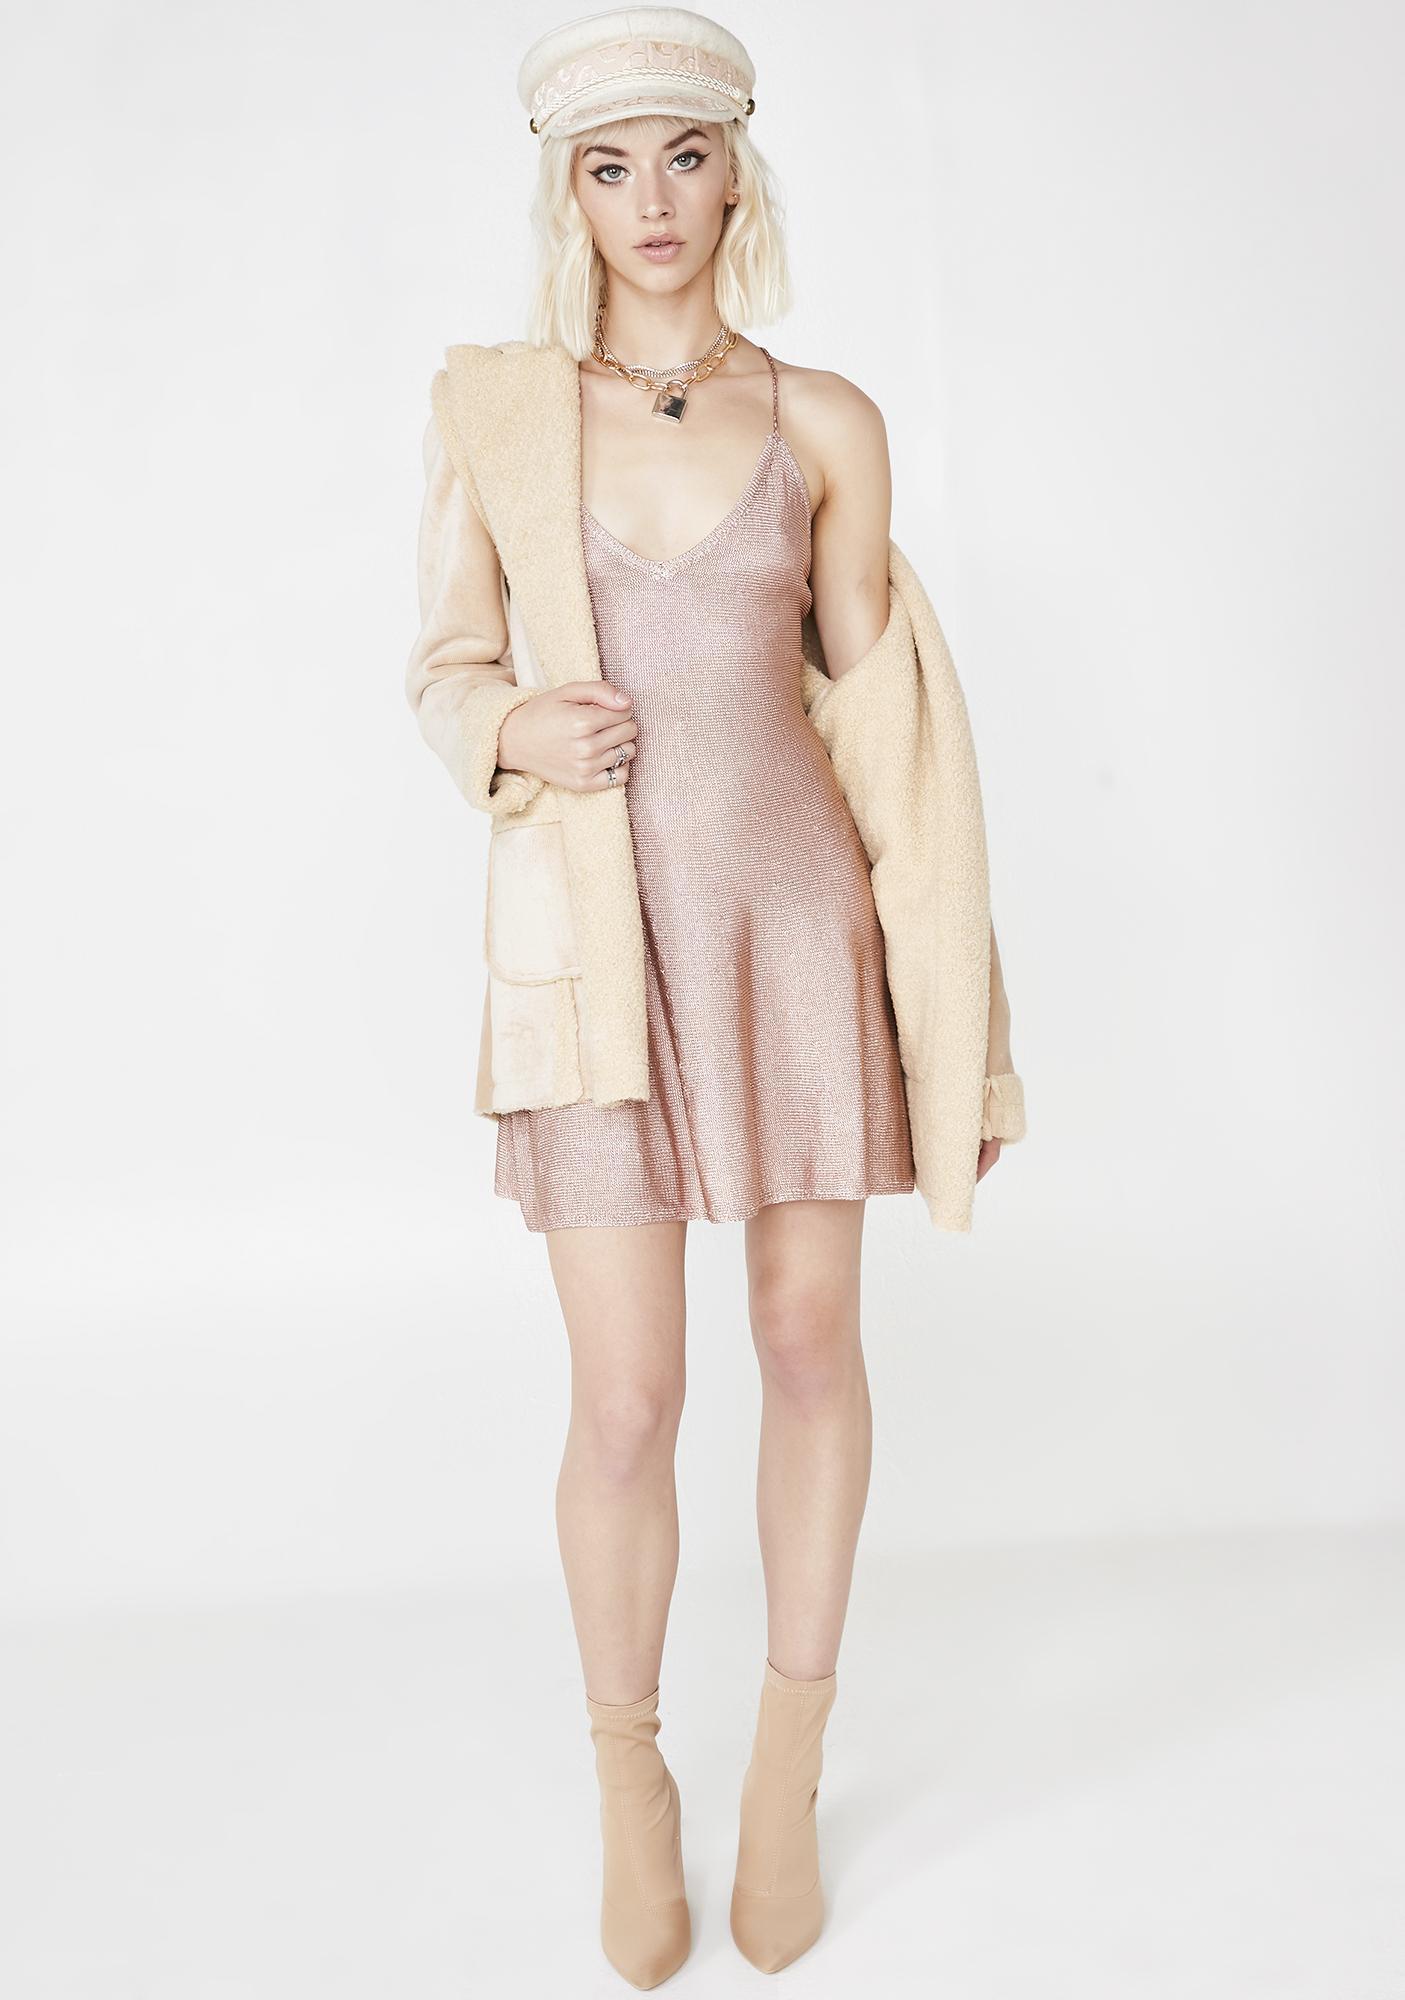 Champagne Wishes Mini Dress